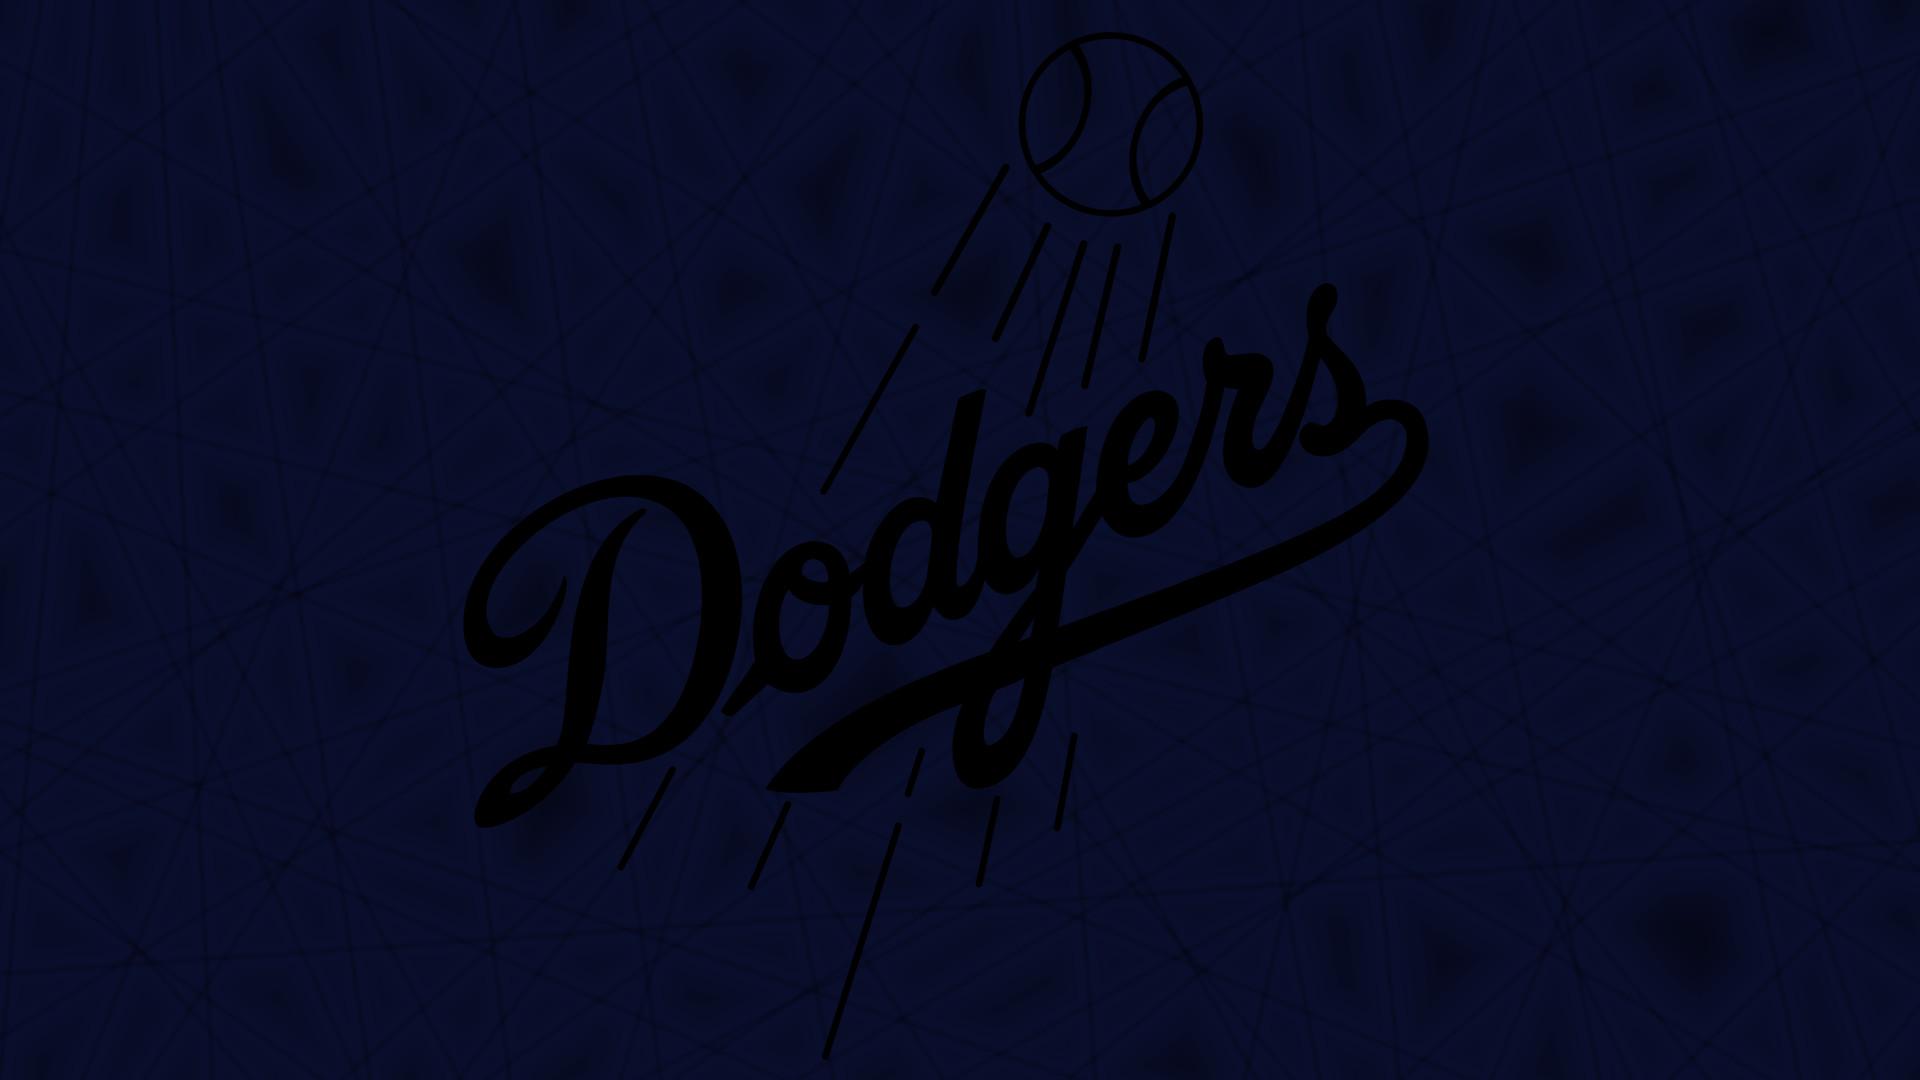 Los Angeles Dodgers Wallpaper 50292